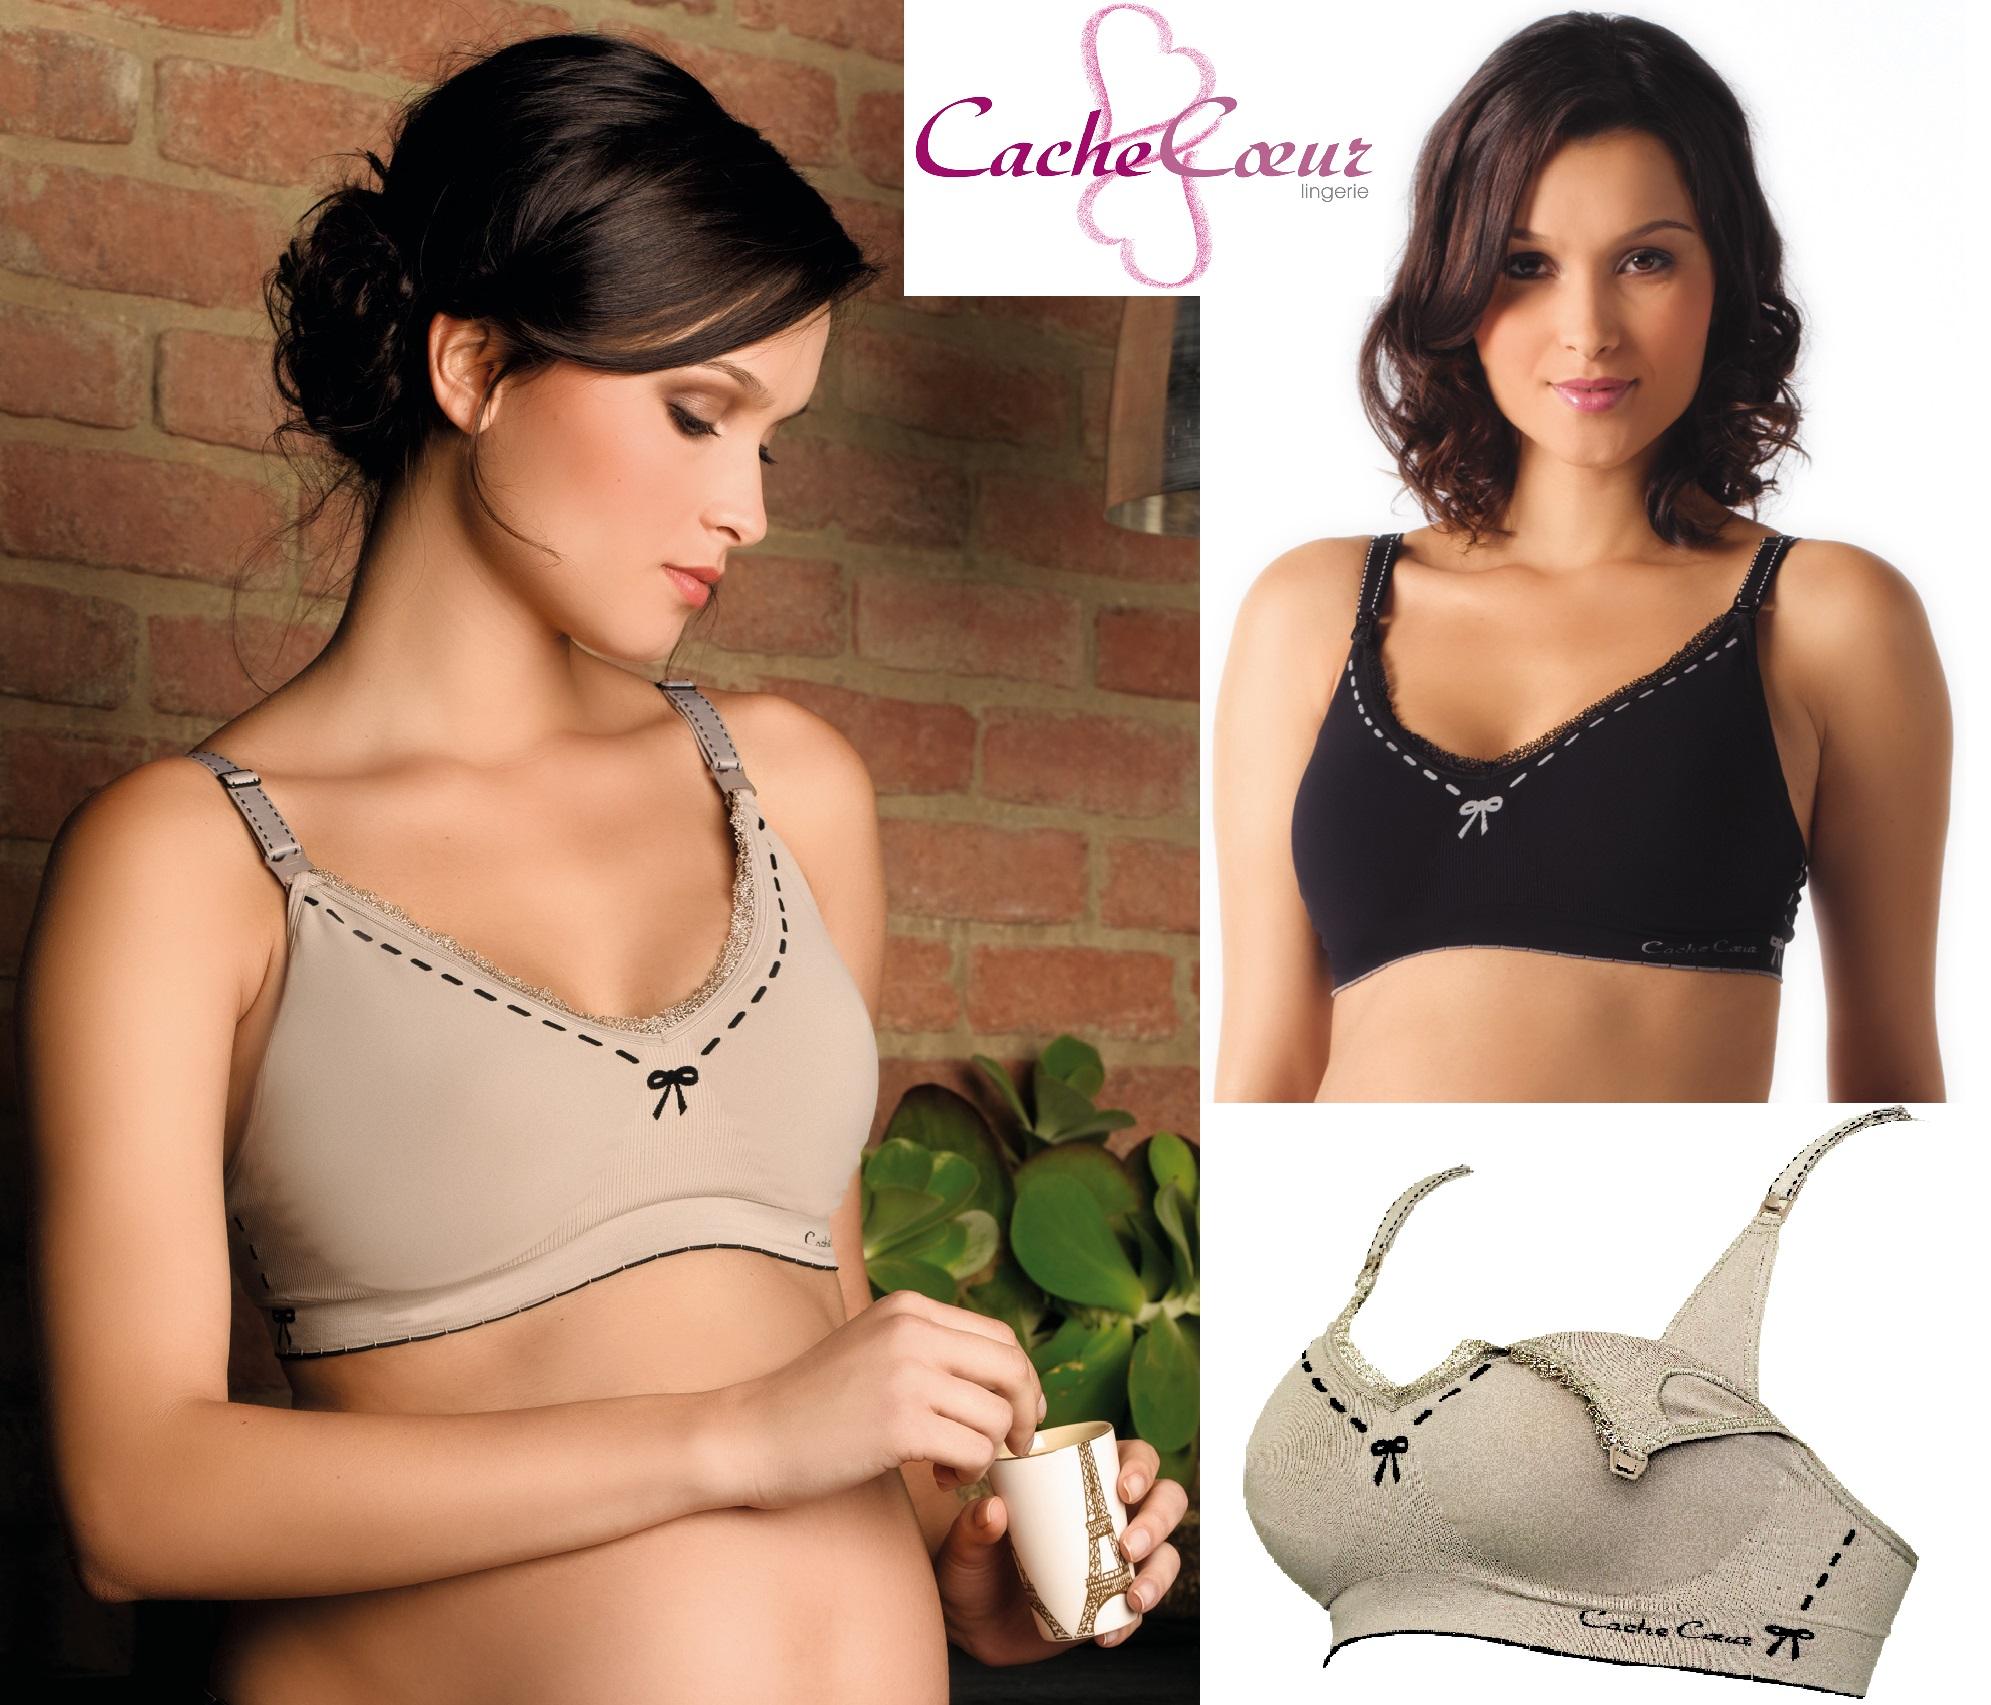 cache-coeur-illusion-nursing-bra-all.jpg